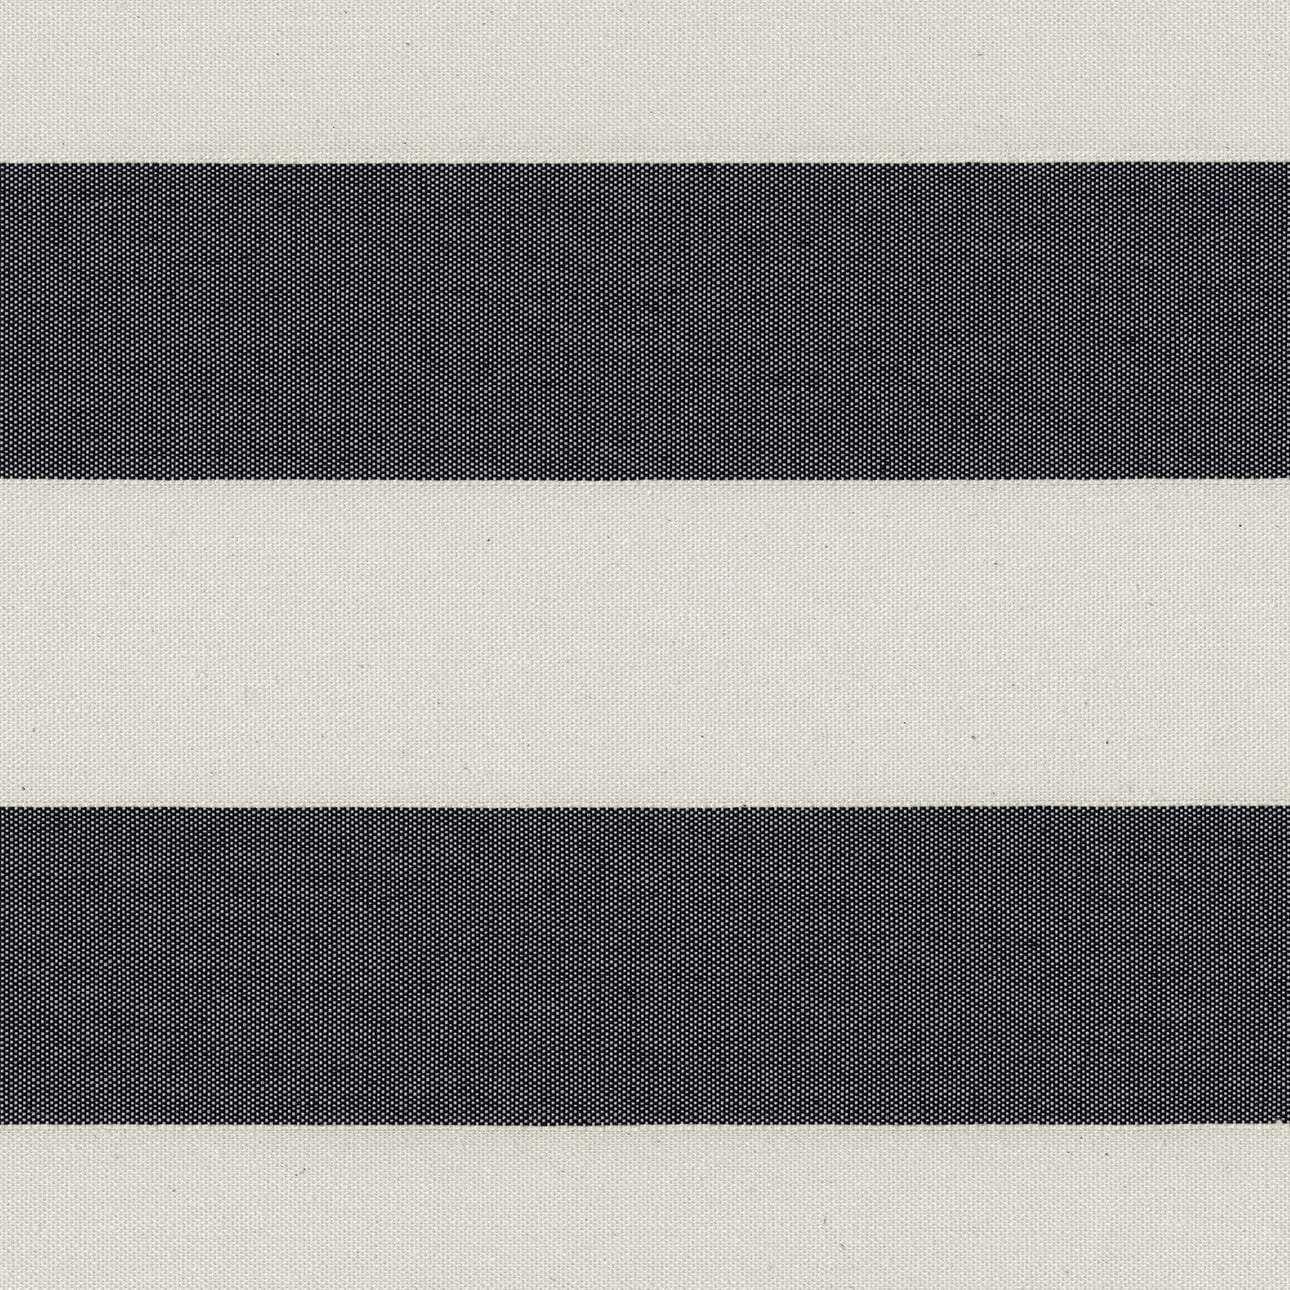 Quadro II 142-72 fra kollektionen Quadro II, Stof: 142-72